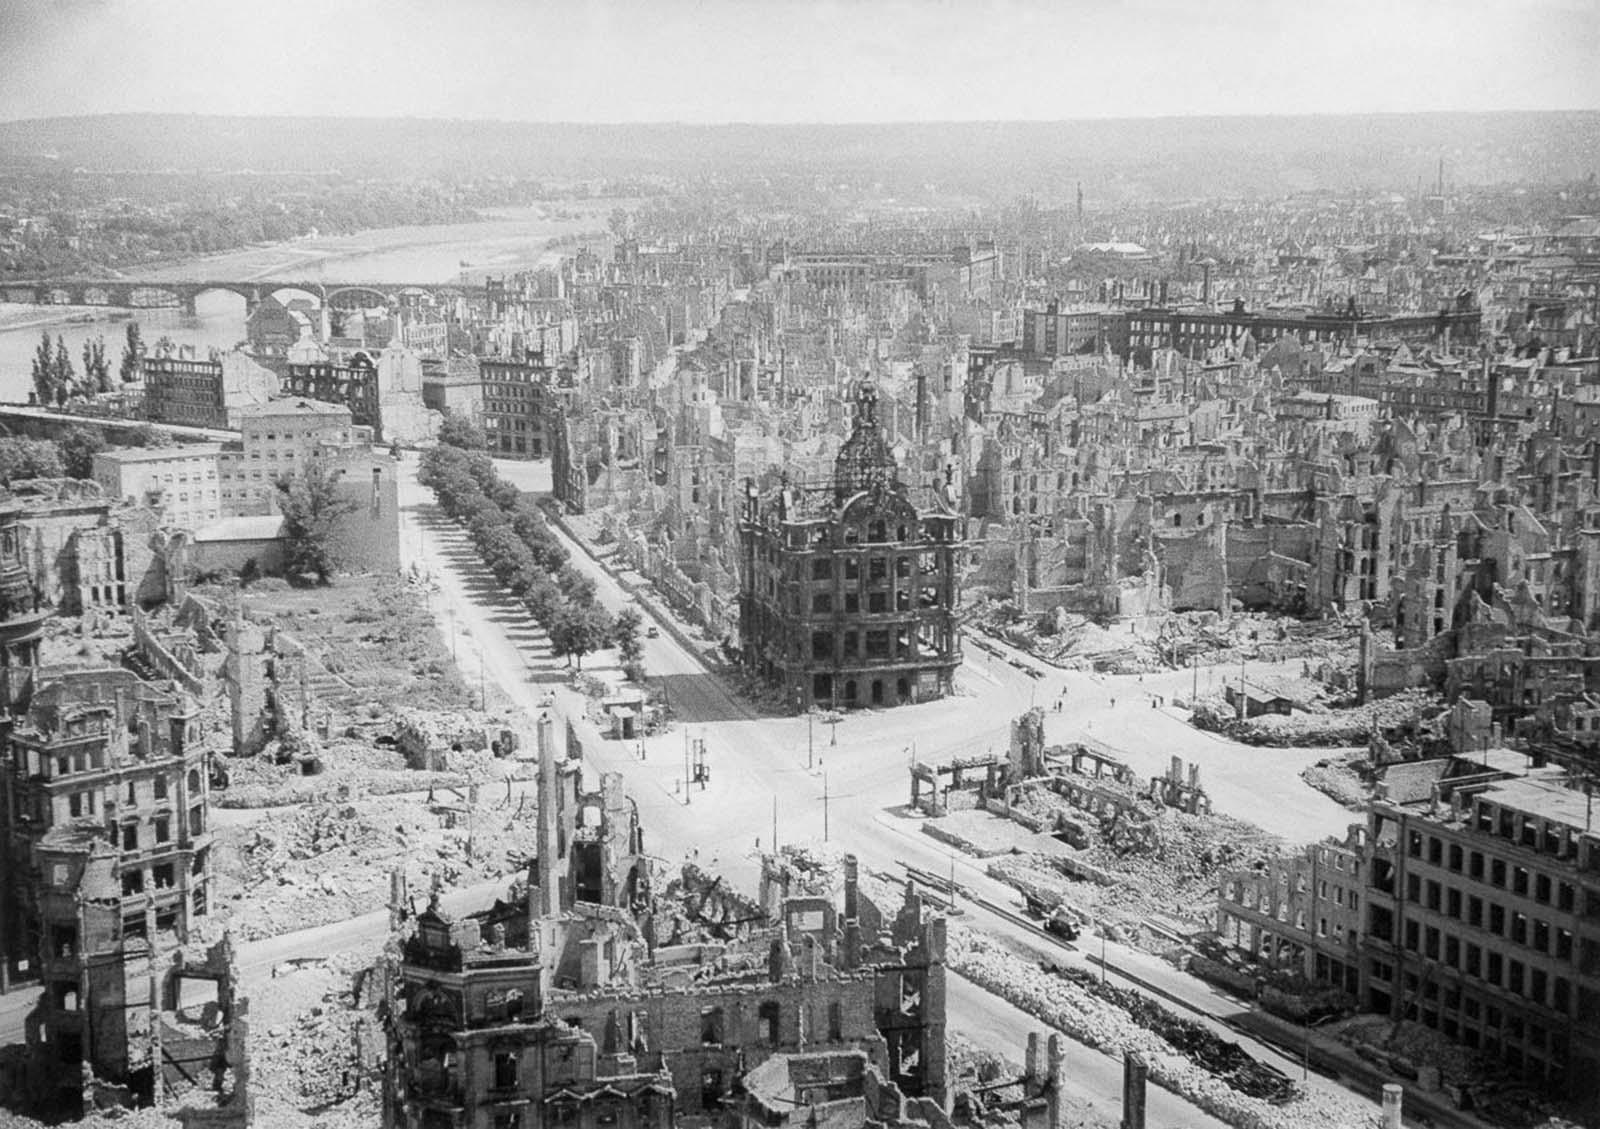 Dresden in March 1945.